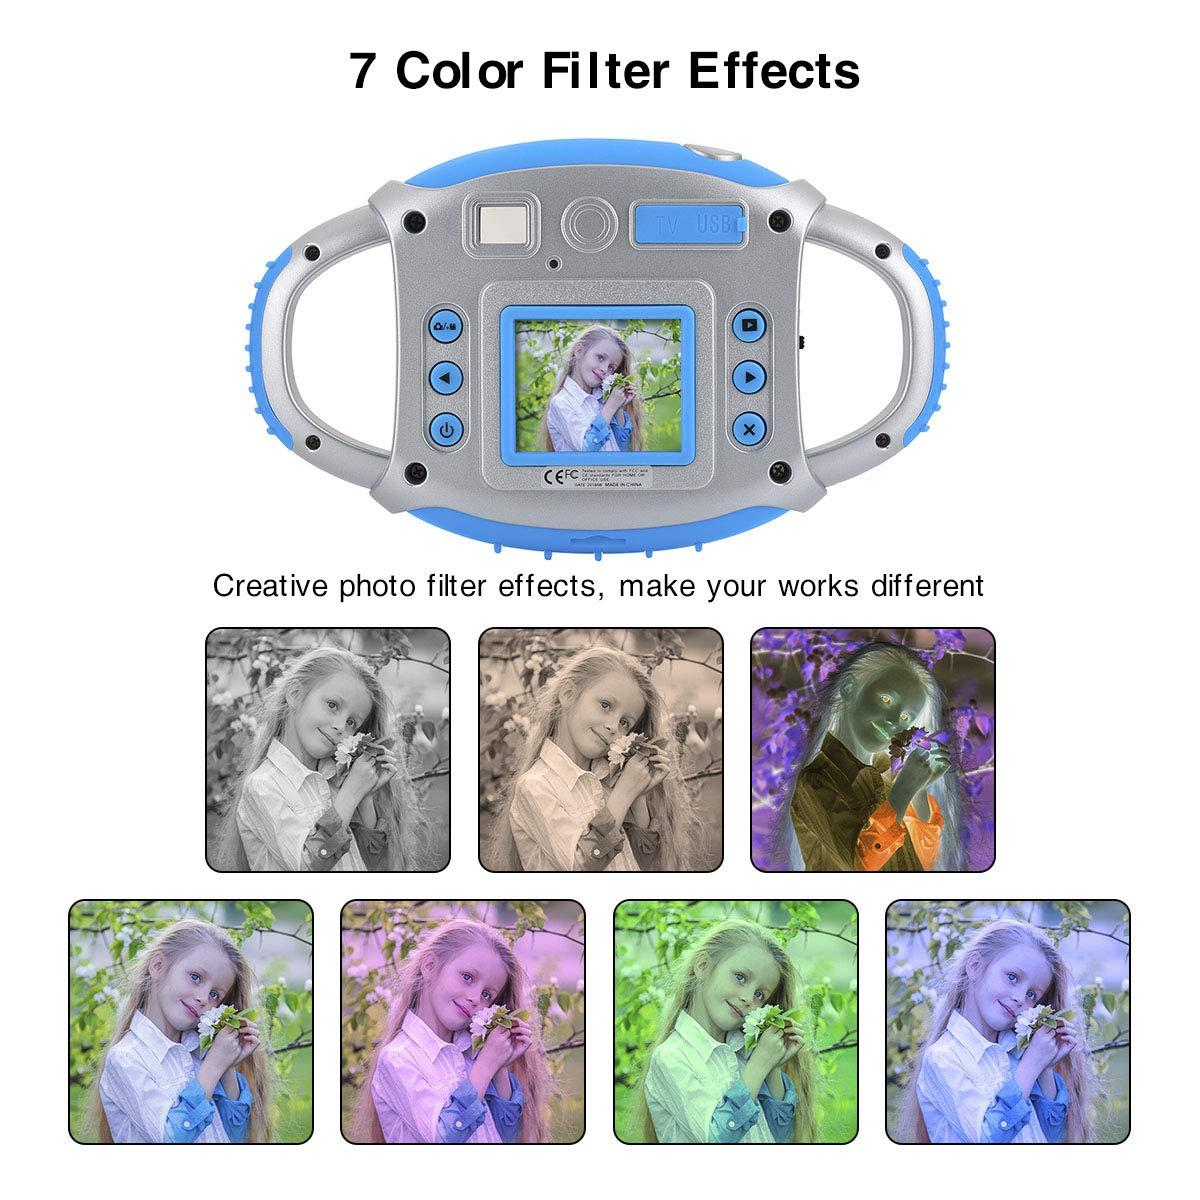 Funkprofi Kids Camera, Kids Digital Video Camera 5MP 1080P HD Recorder Camcorder with 32GB TF Memory Card, 1.77 Inch Screen, Funny Photo Frame, for Kids by Funkprofi (Image #5)